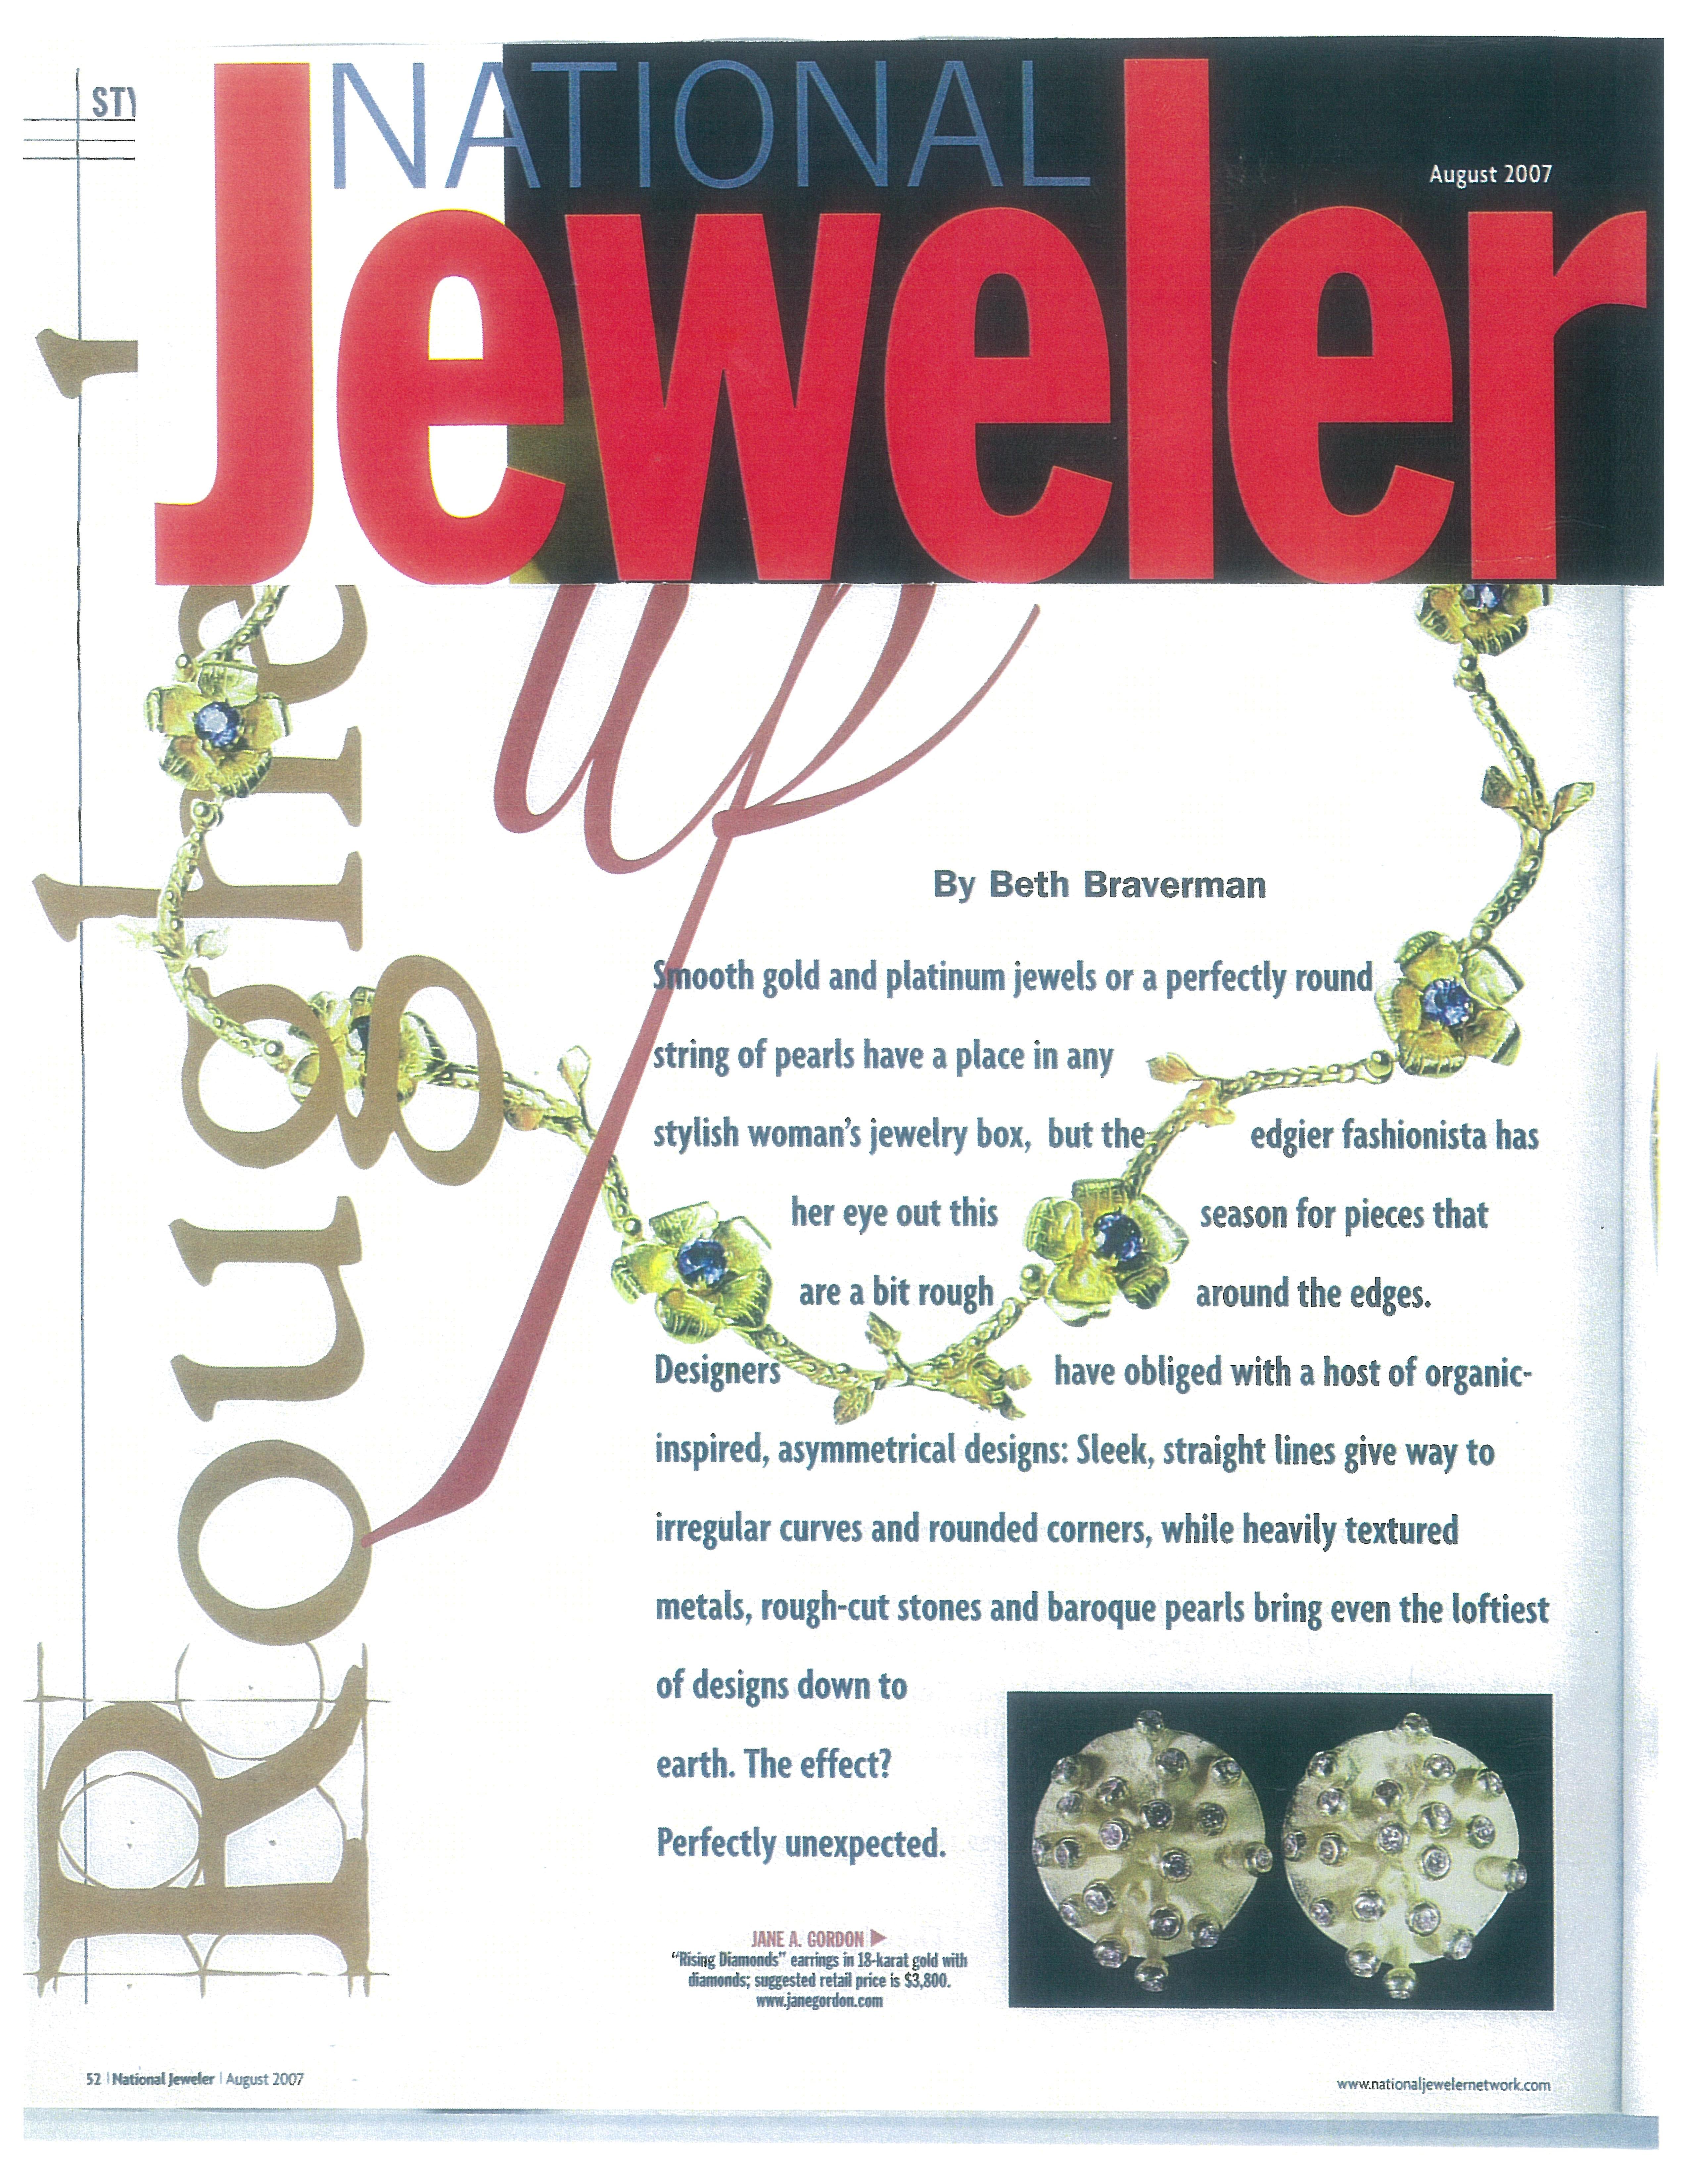 national-jeweler-rising-diamonds-jane-a-gordon-celebration-jewelry-janegordon-com.jpg